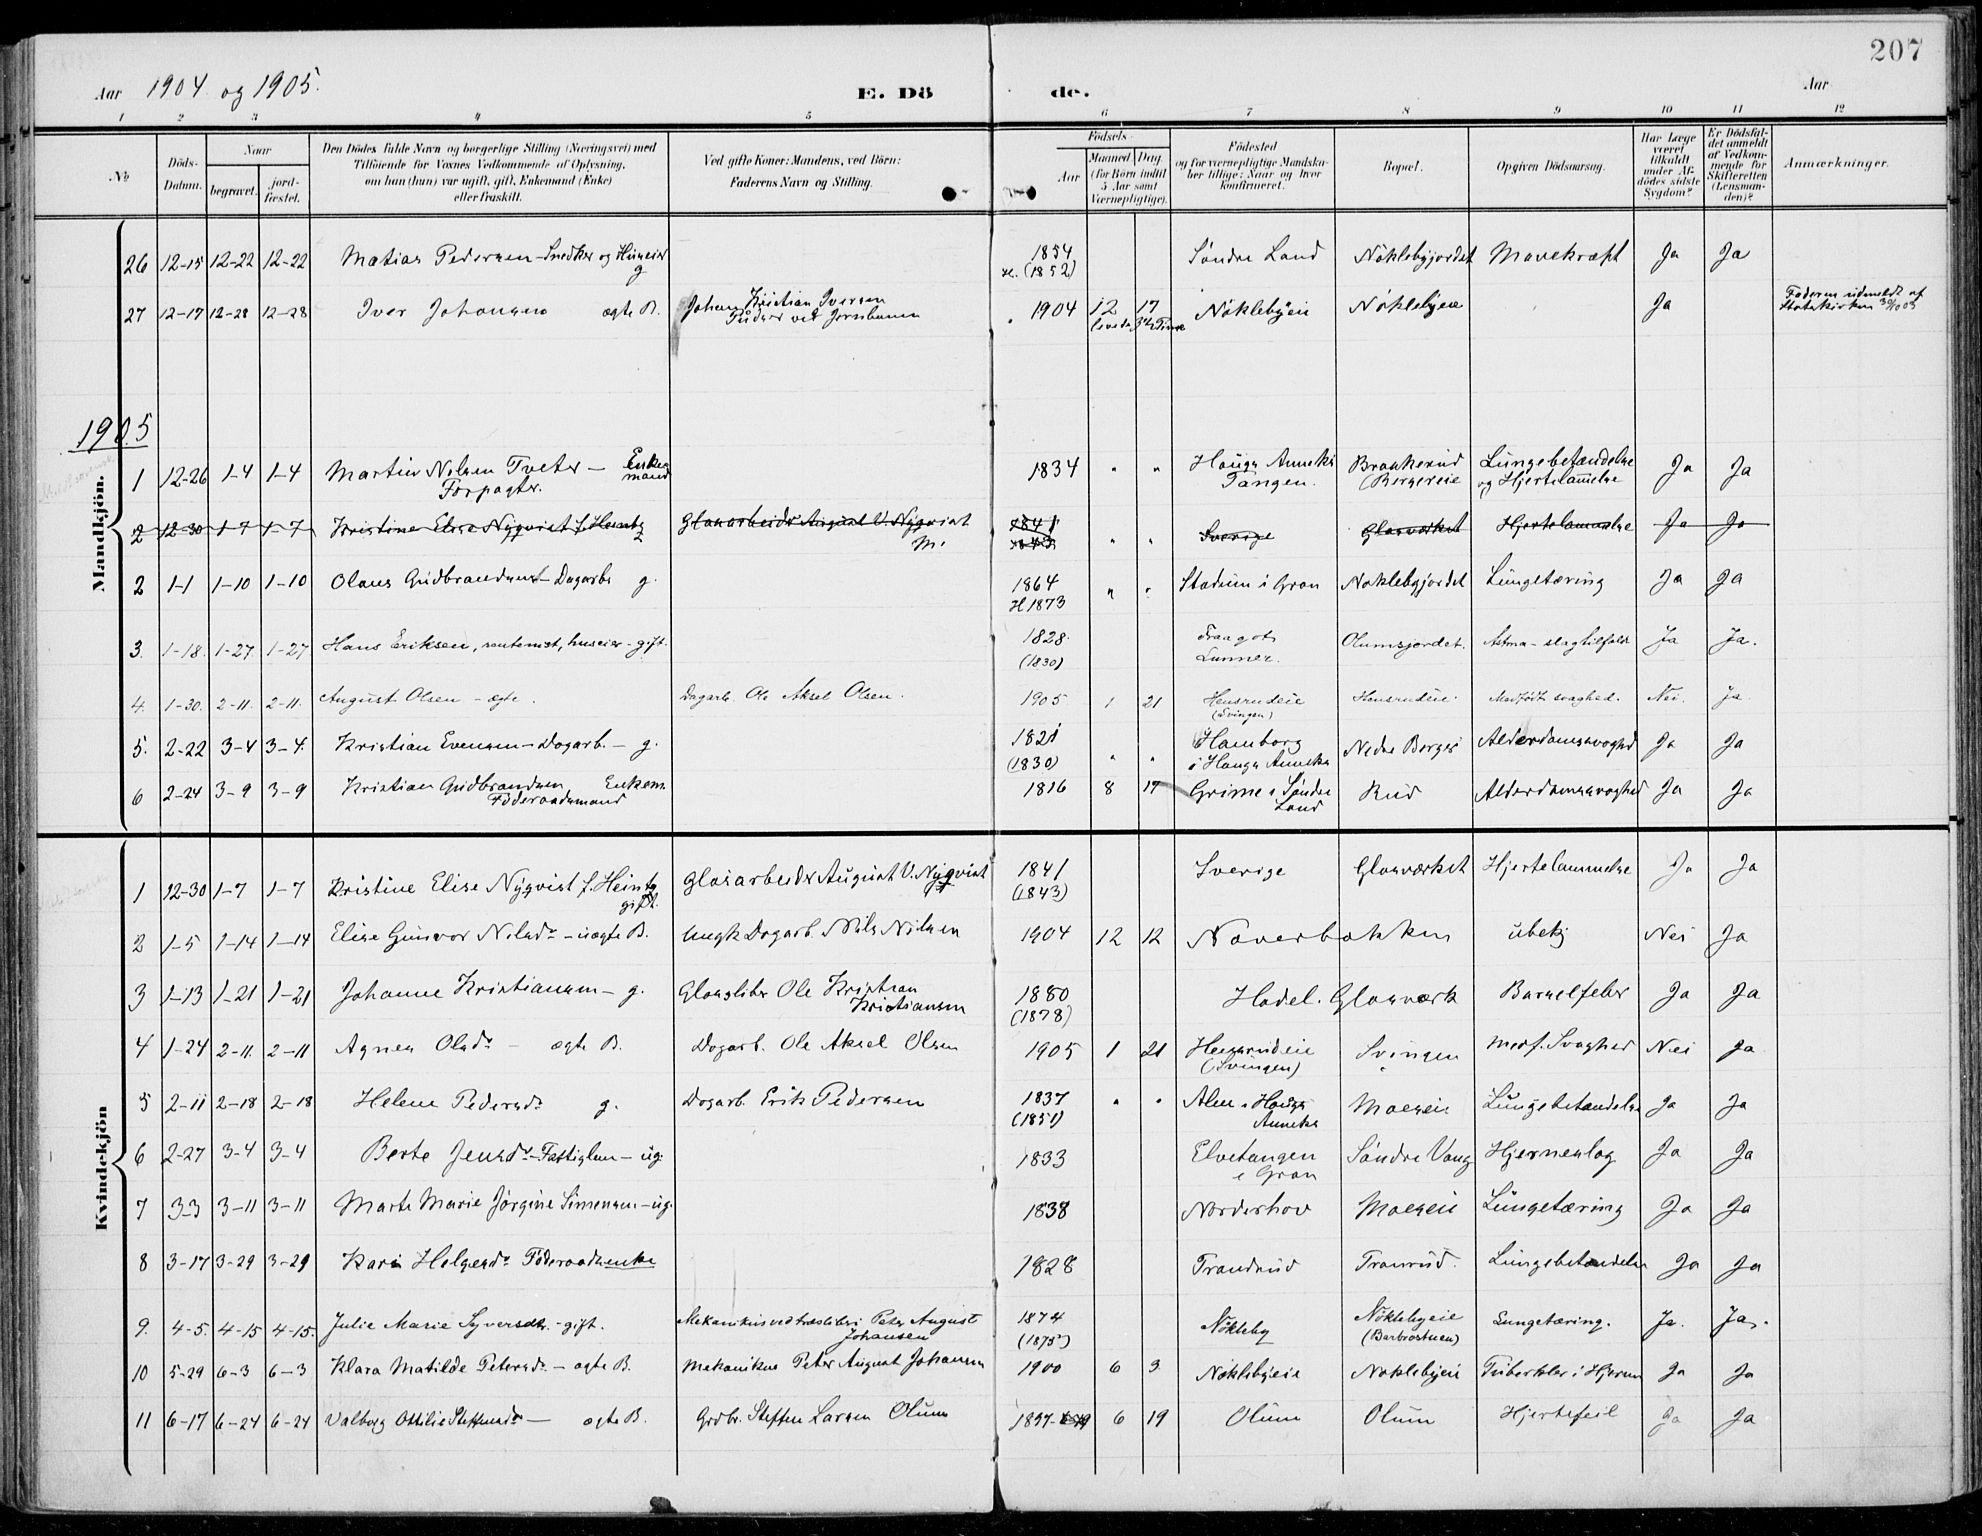 SAH, Jevnaker prestekontor, Ministerialbok nr. 11, 1902-1913, s. 207